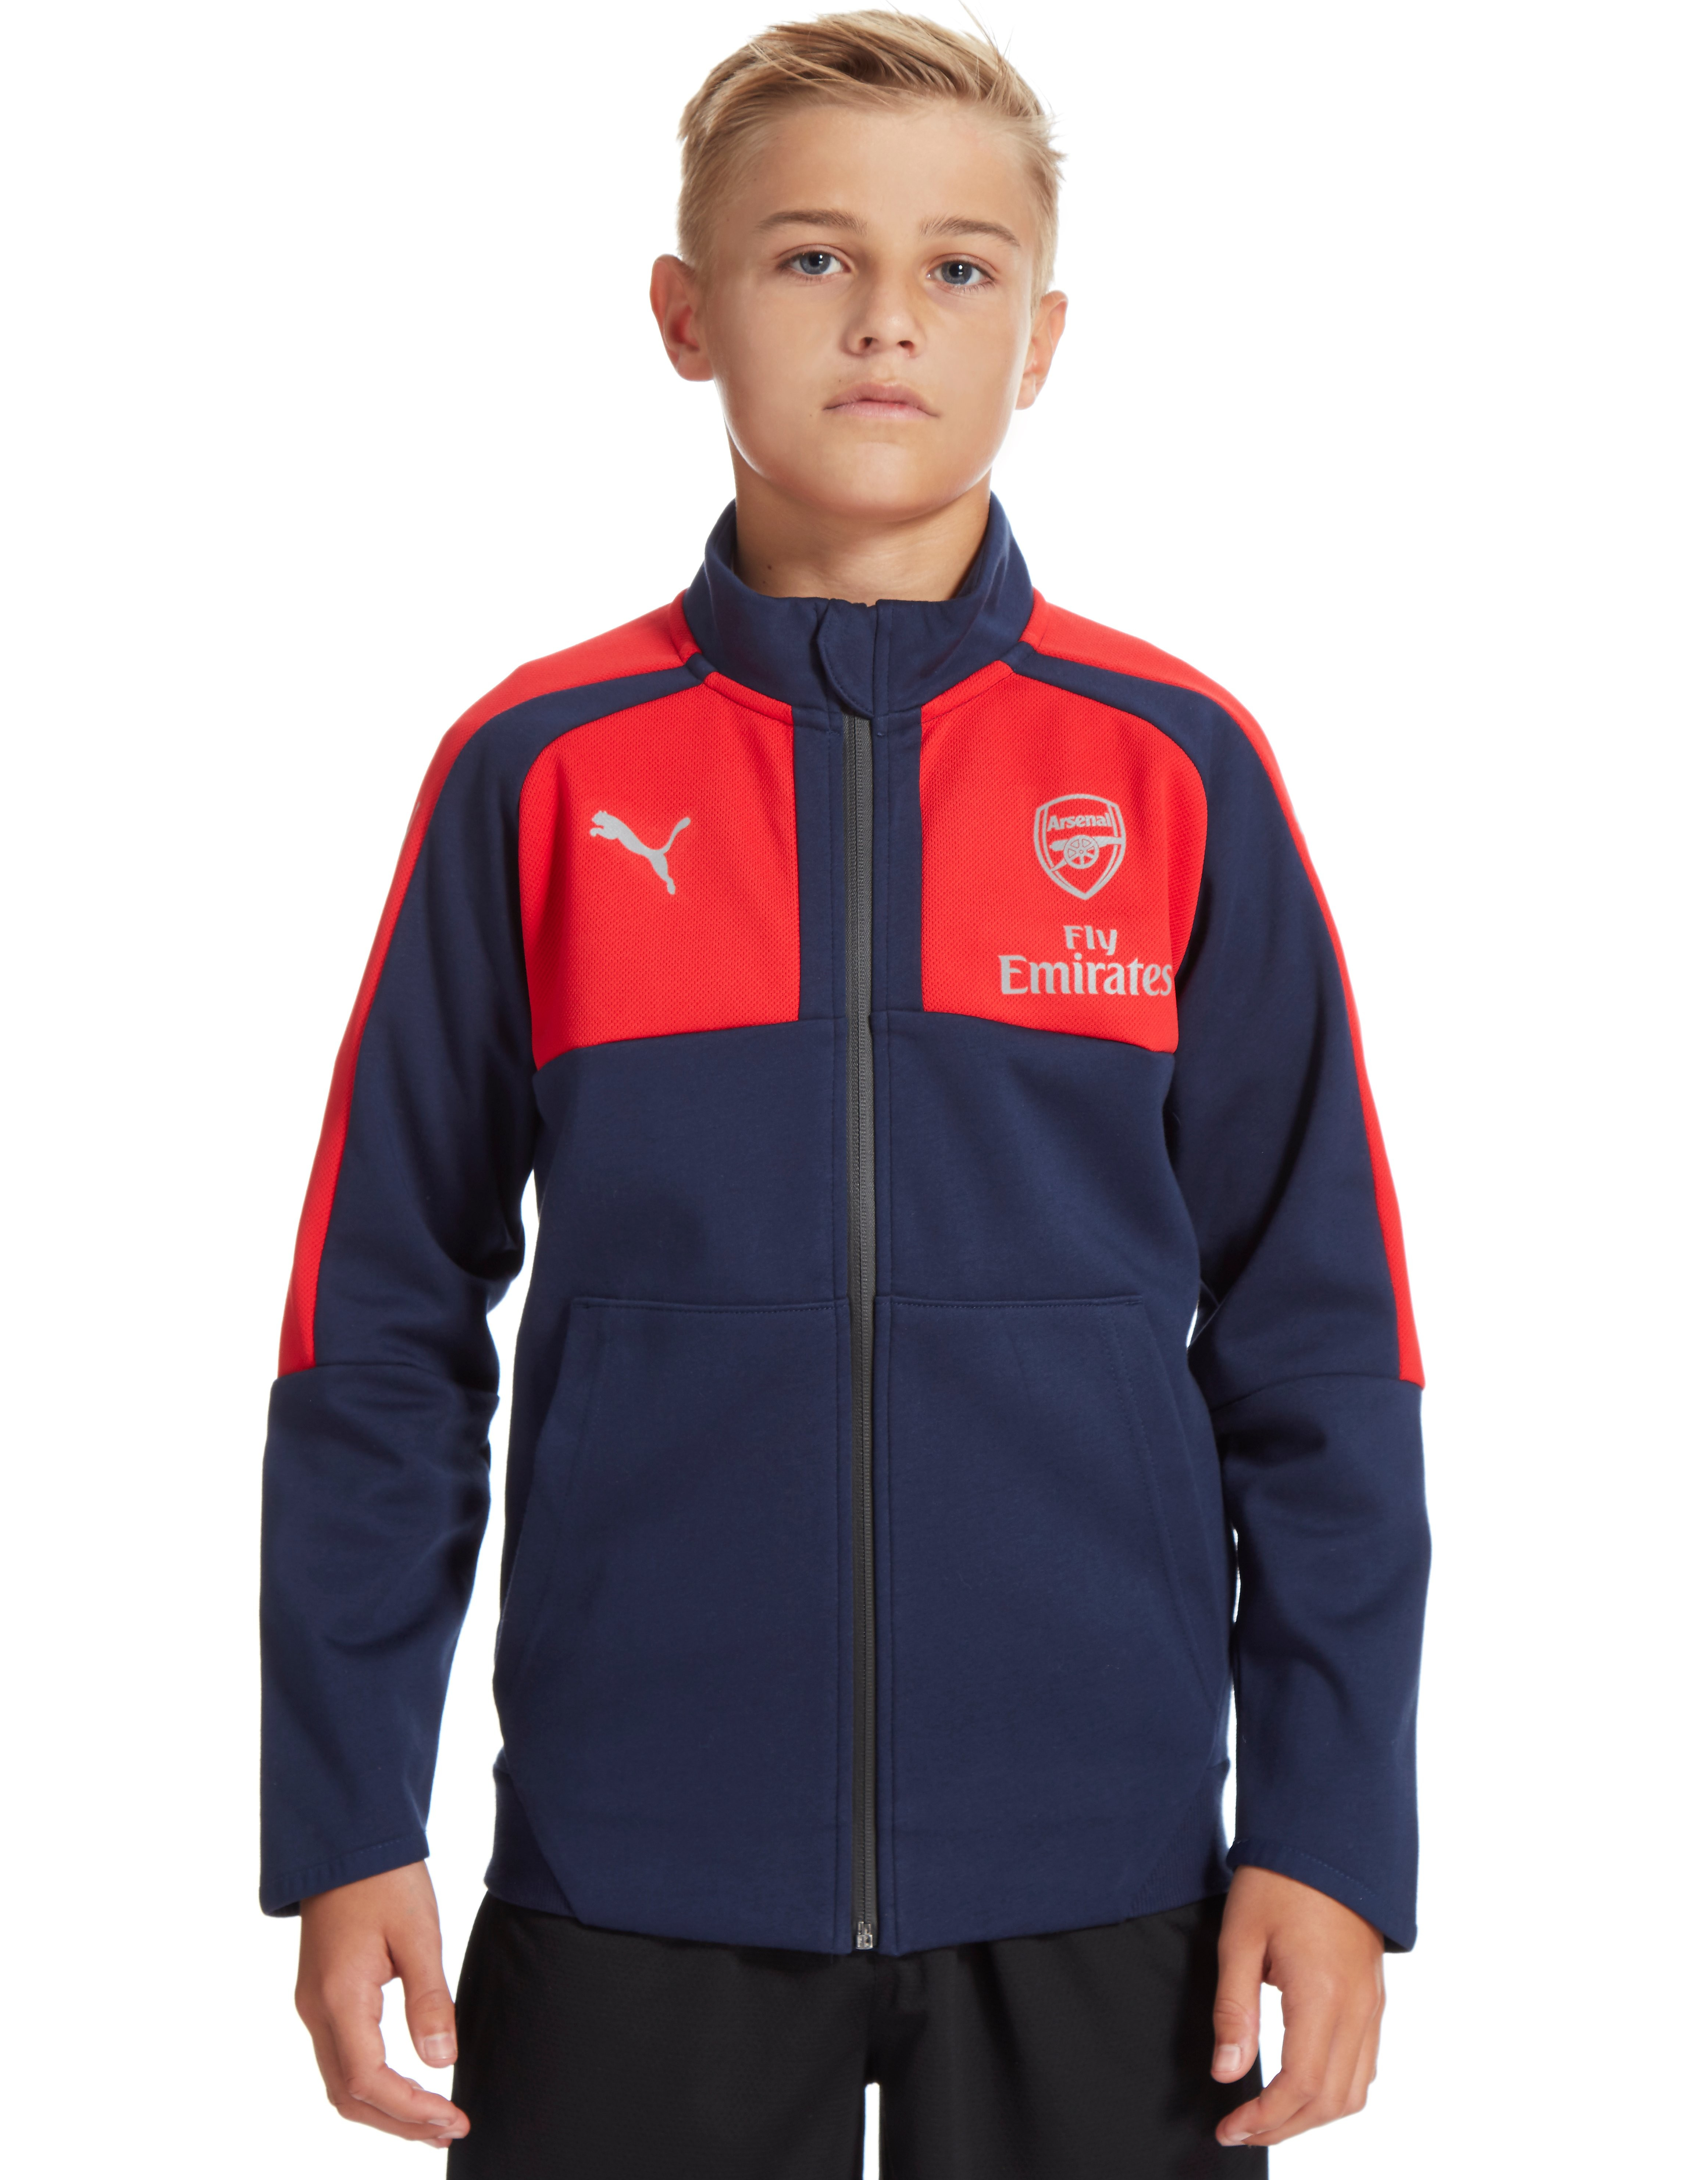 PUMA Arsenal FC Casual Performance Track Jacket Junior